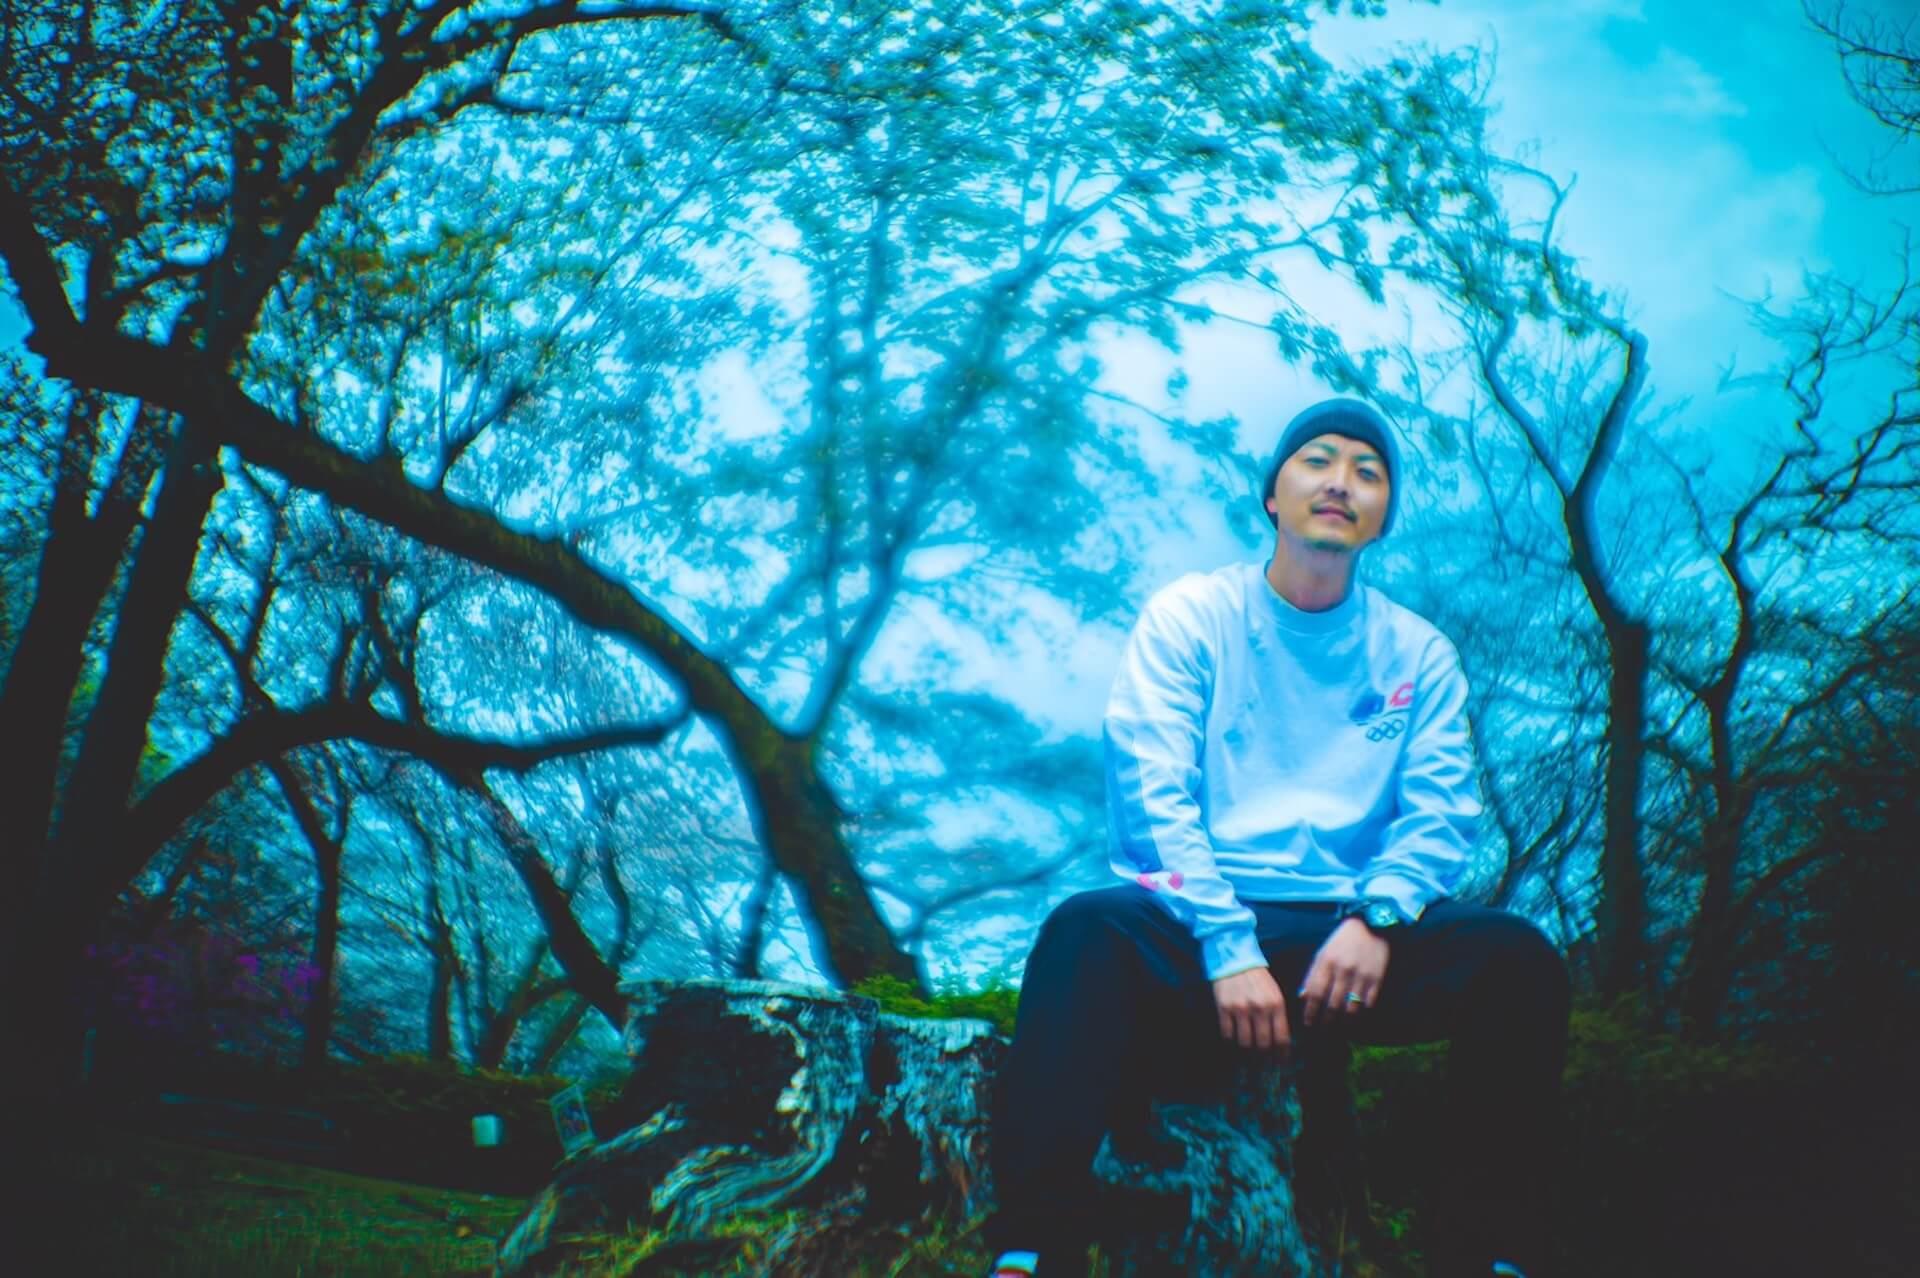 KOYANMUSICと西東京のビートメーカーB.T.Reo 440がジョイント・ビートテープ『Tasty!』のリリースを発表!ティザー映像が公開 music210511_koyanmusic-btreo440_1